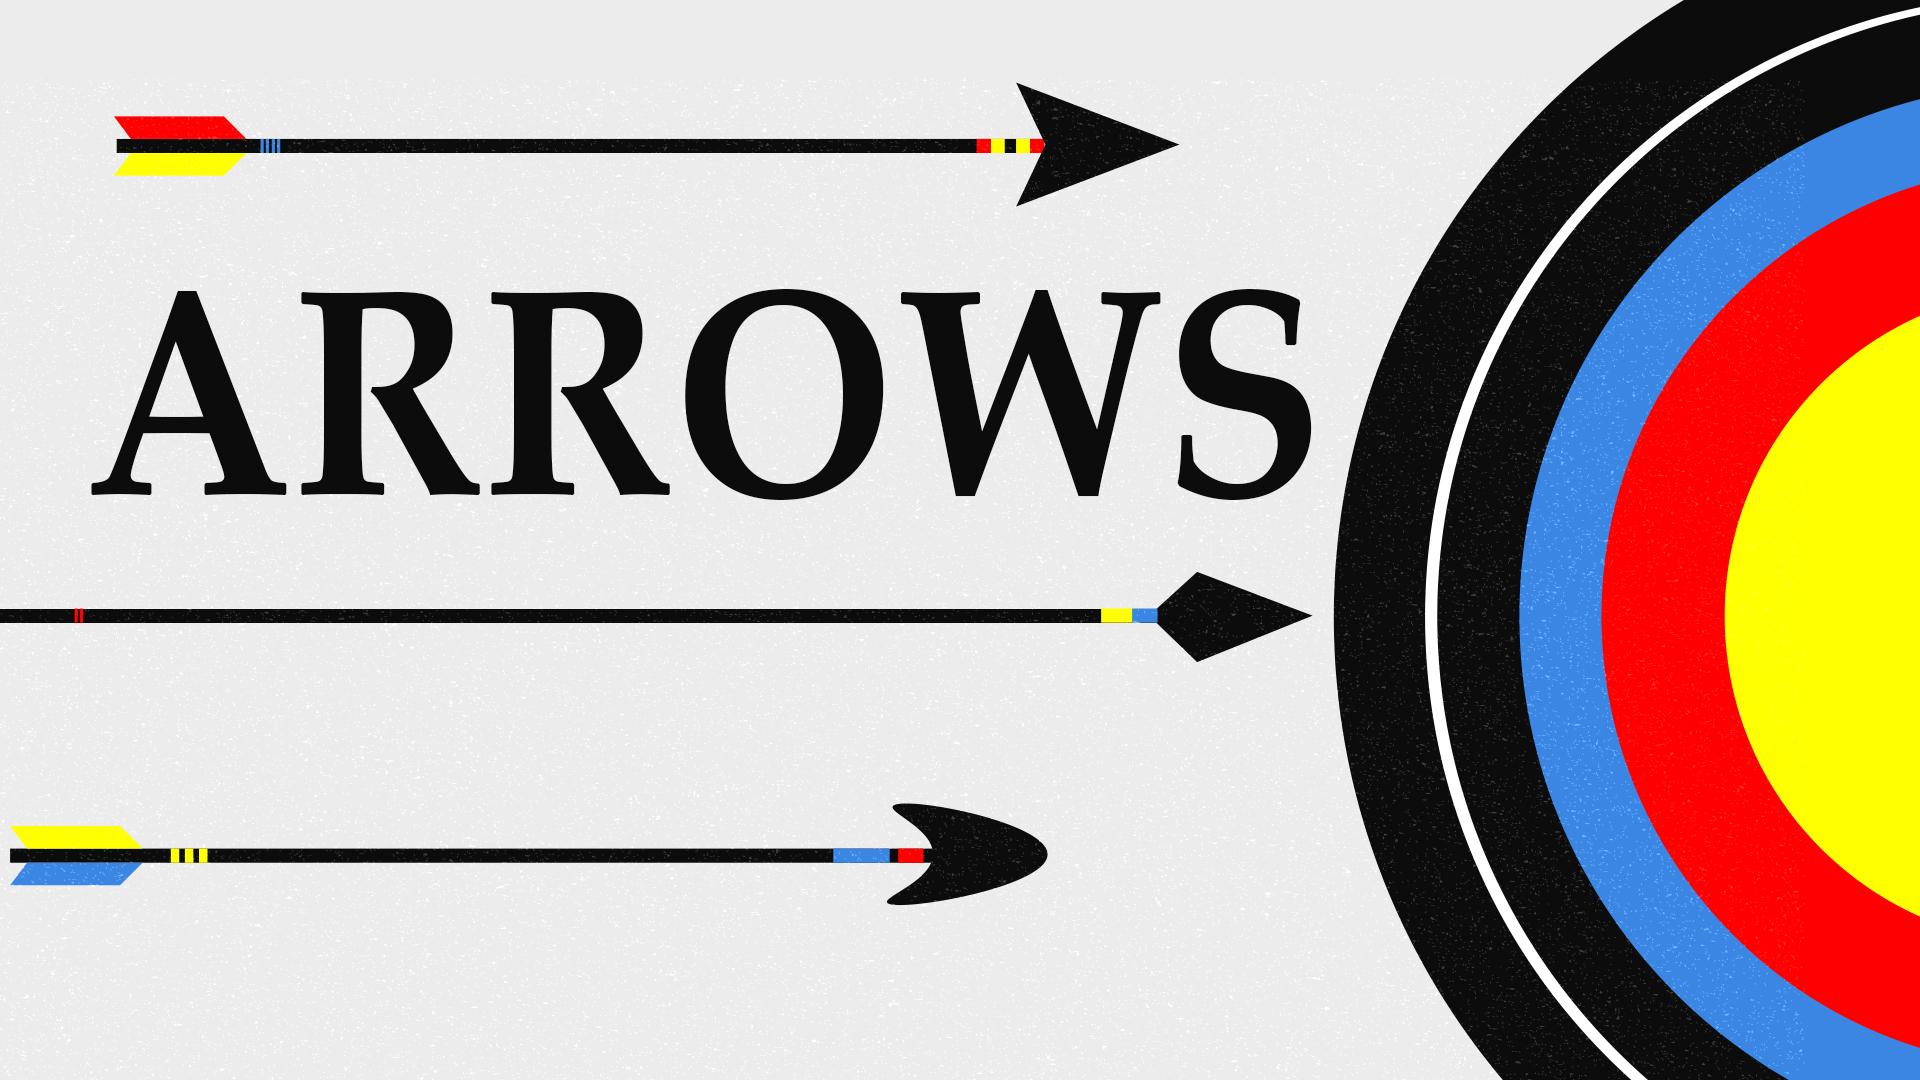 Arrows Screen Graphic.jpg